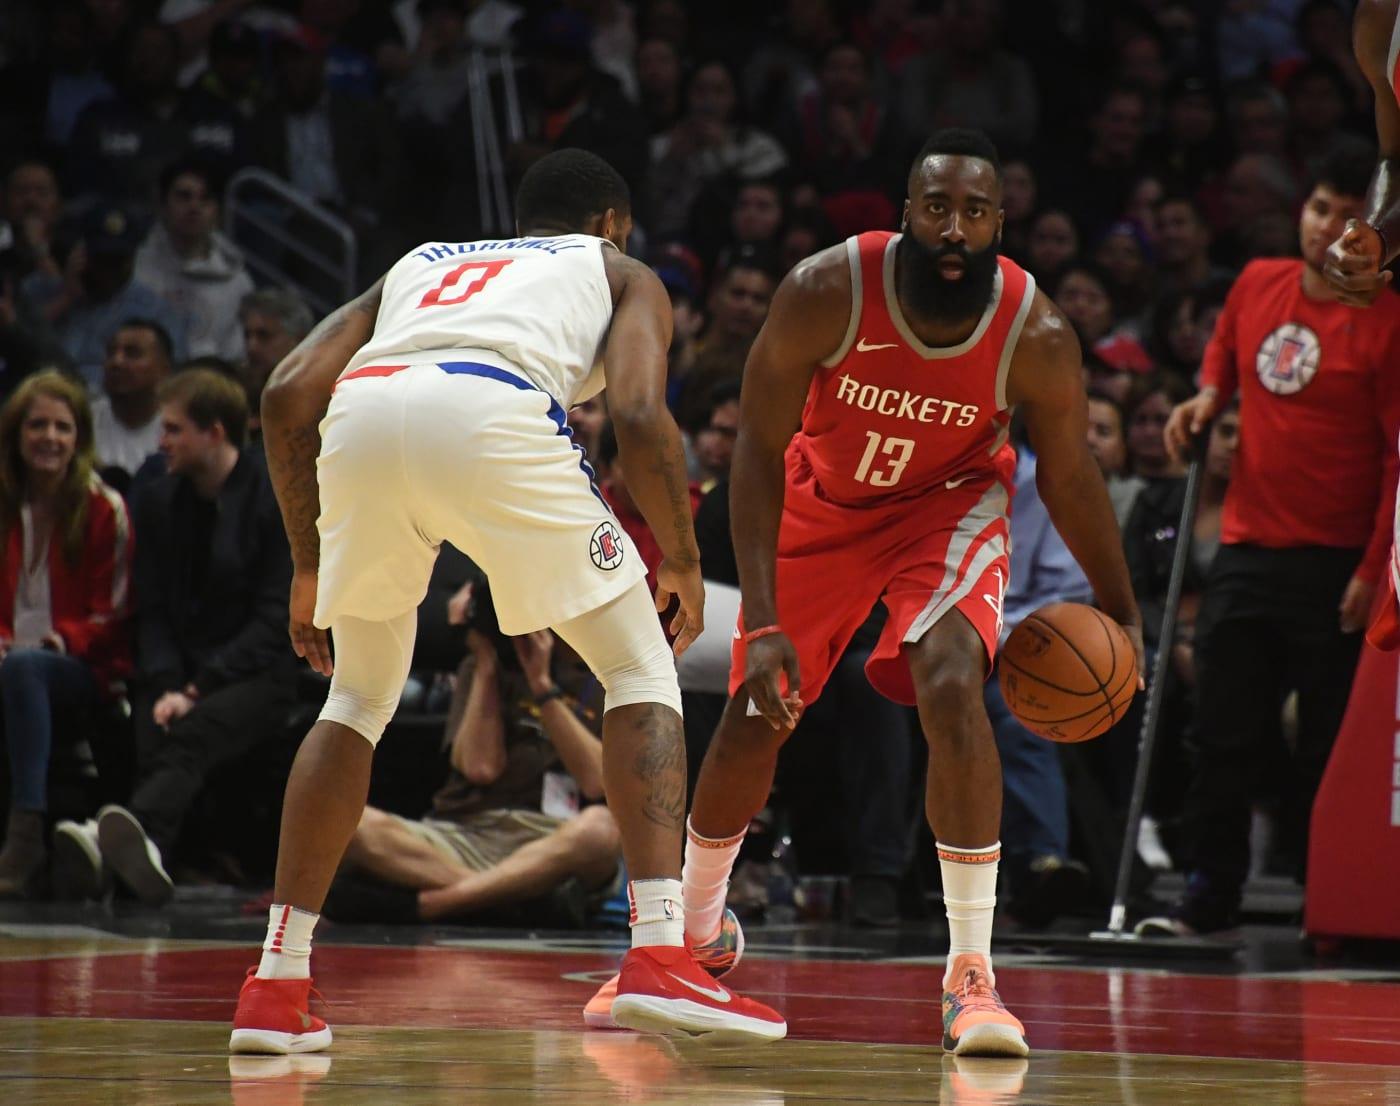 James Harden Clippers Rockets Feb. 2018